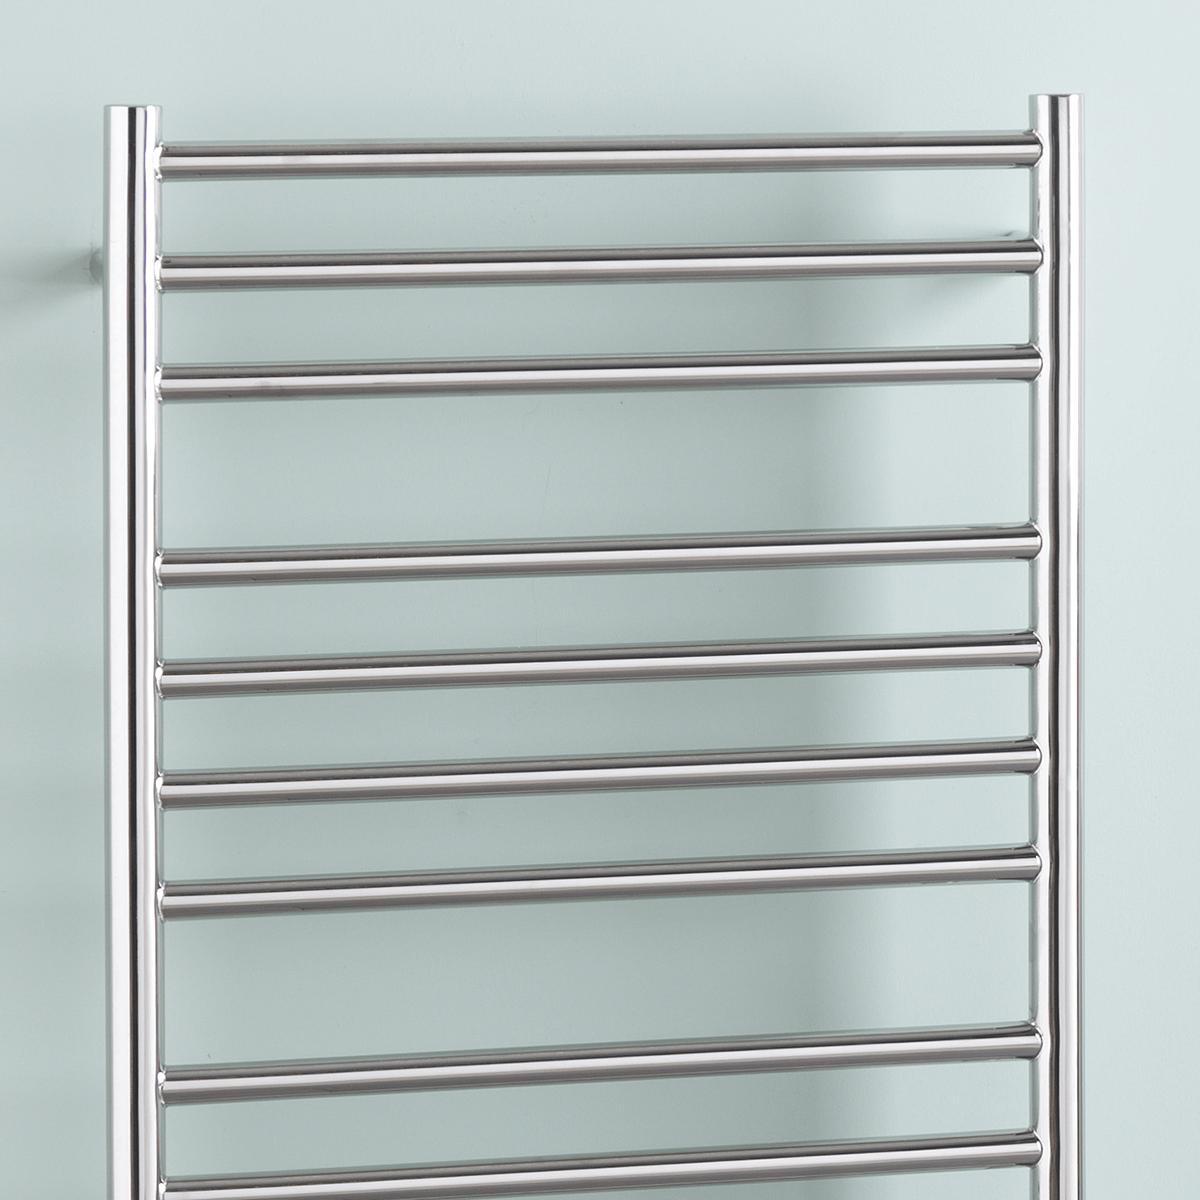 Braddan Stainless Steel Heated Towel Rail Warmer: Stainless Steel Heated Towel Rail Radiator